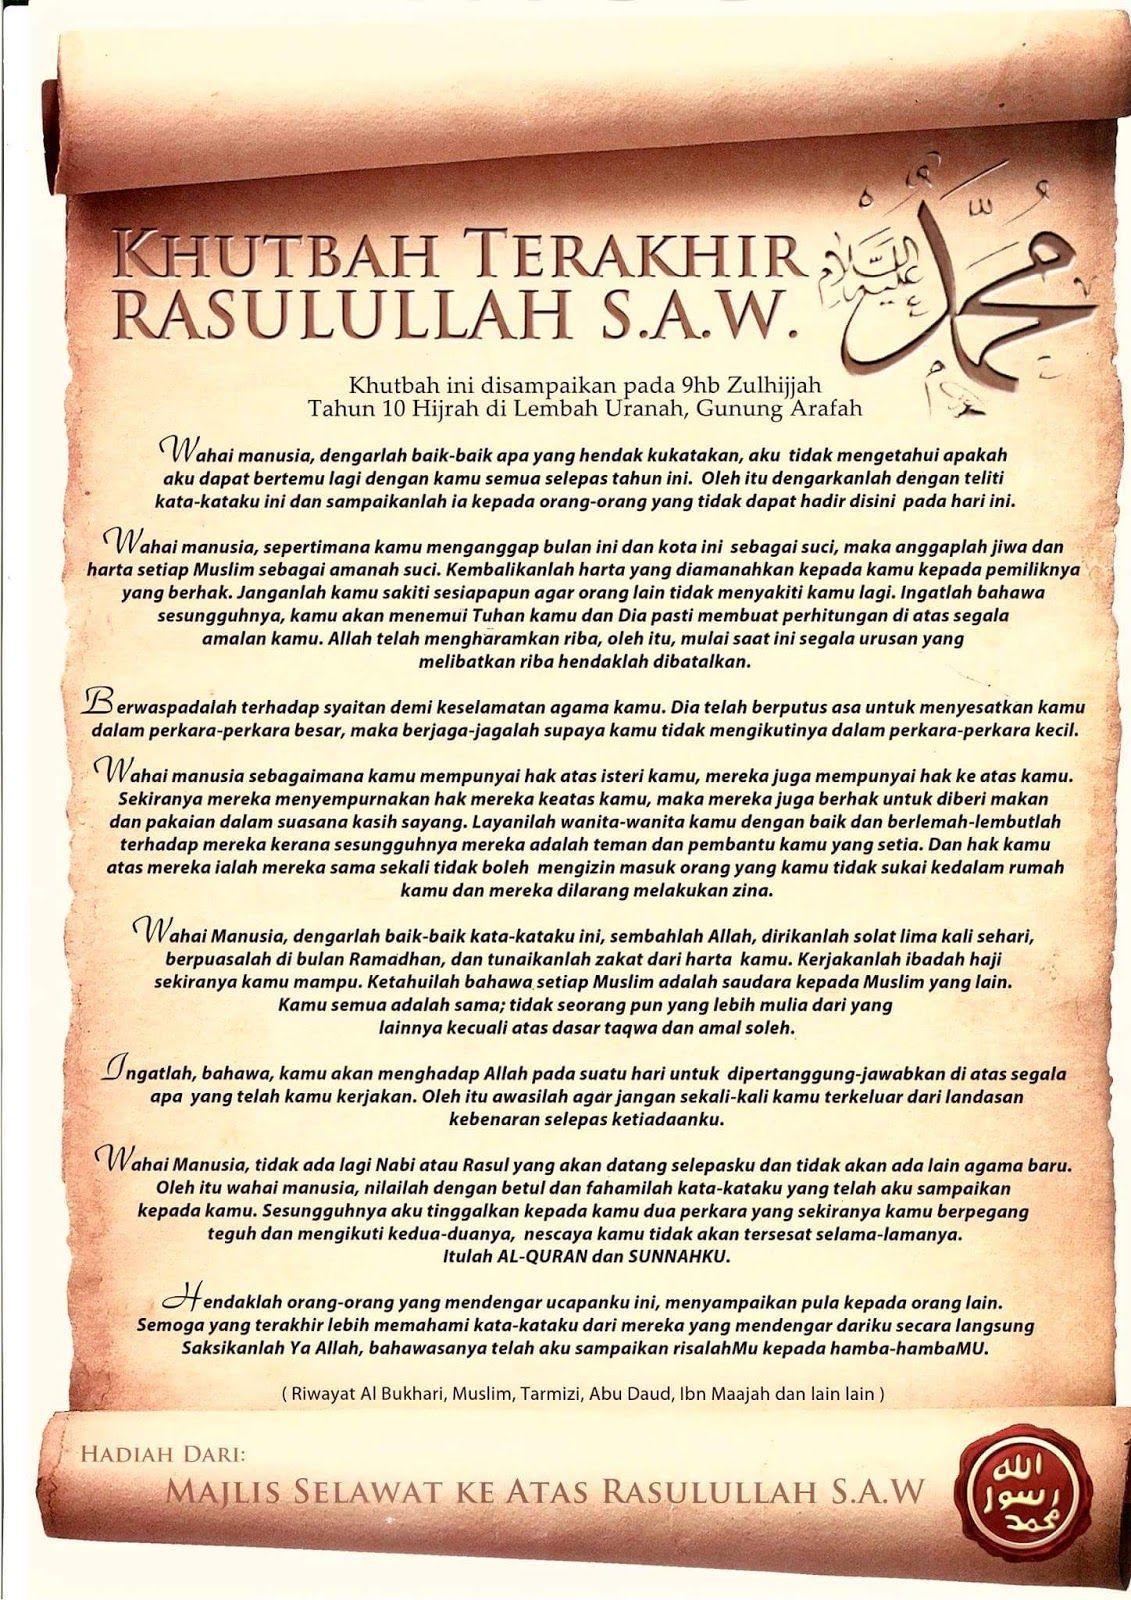 Khutbah Terakhir Rasulullah S A W Islamic Quotes Kutipan Agama